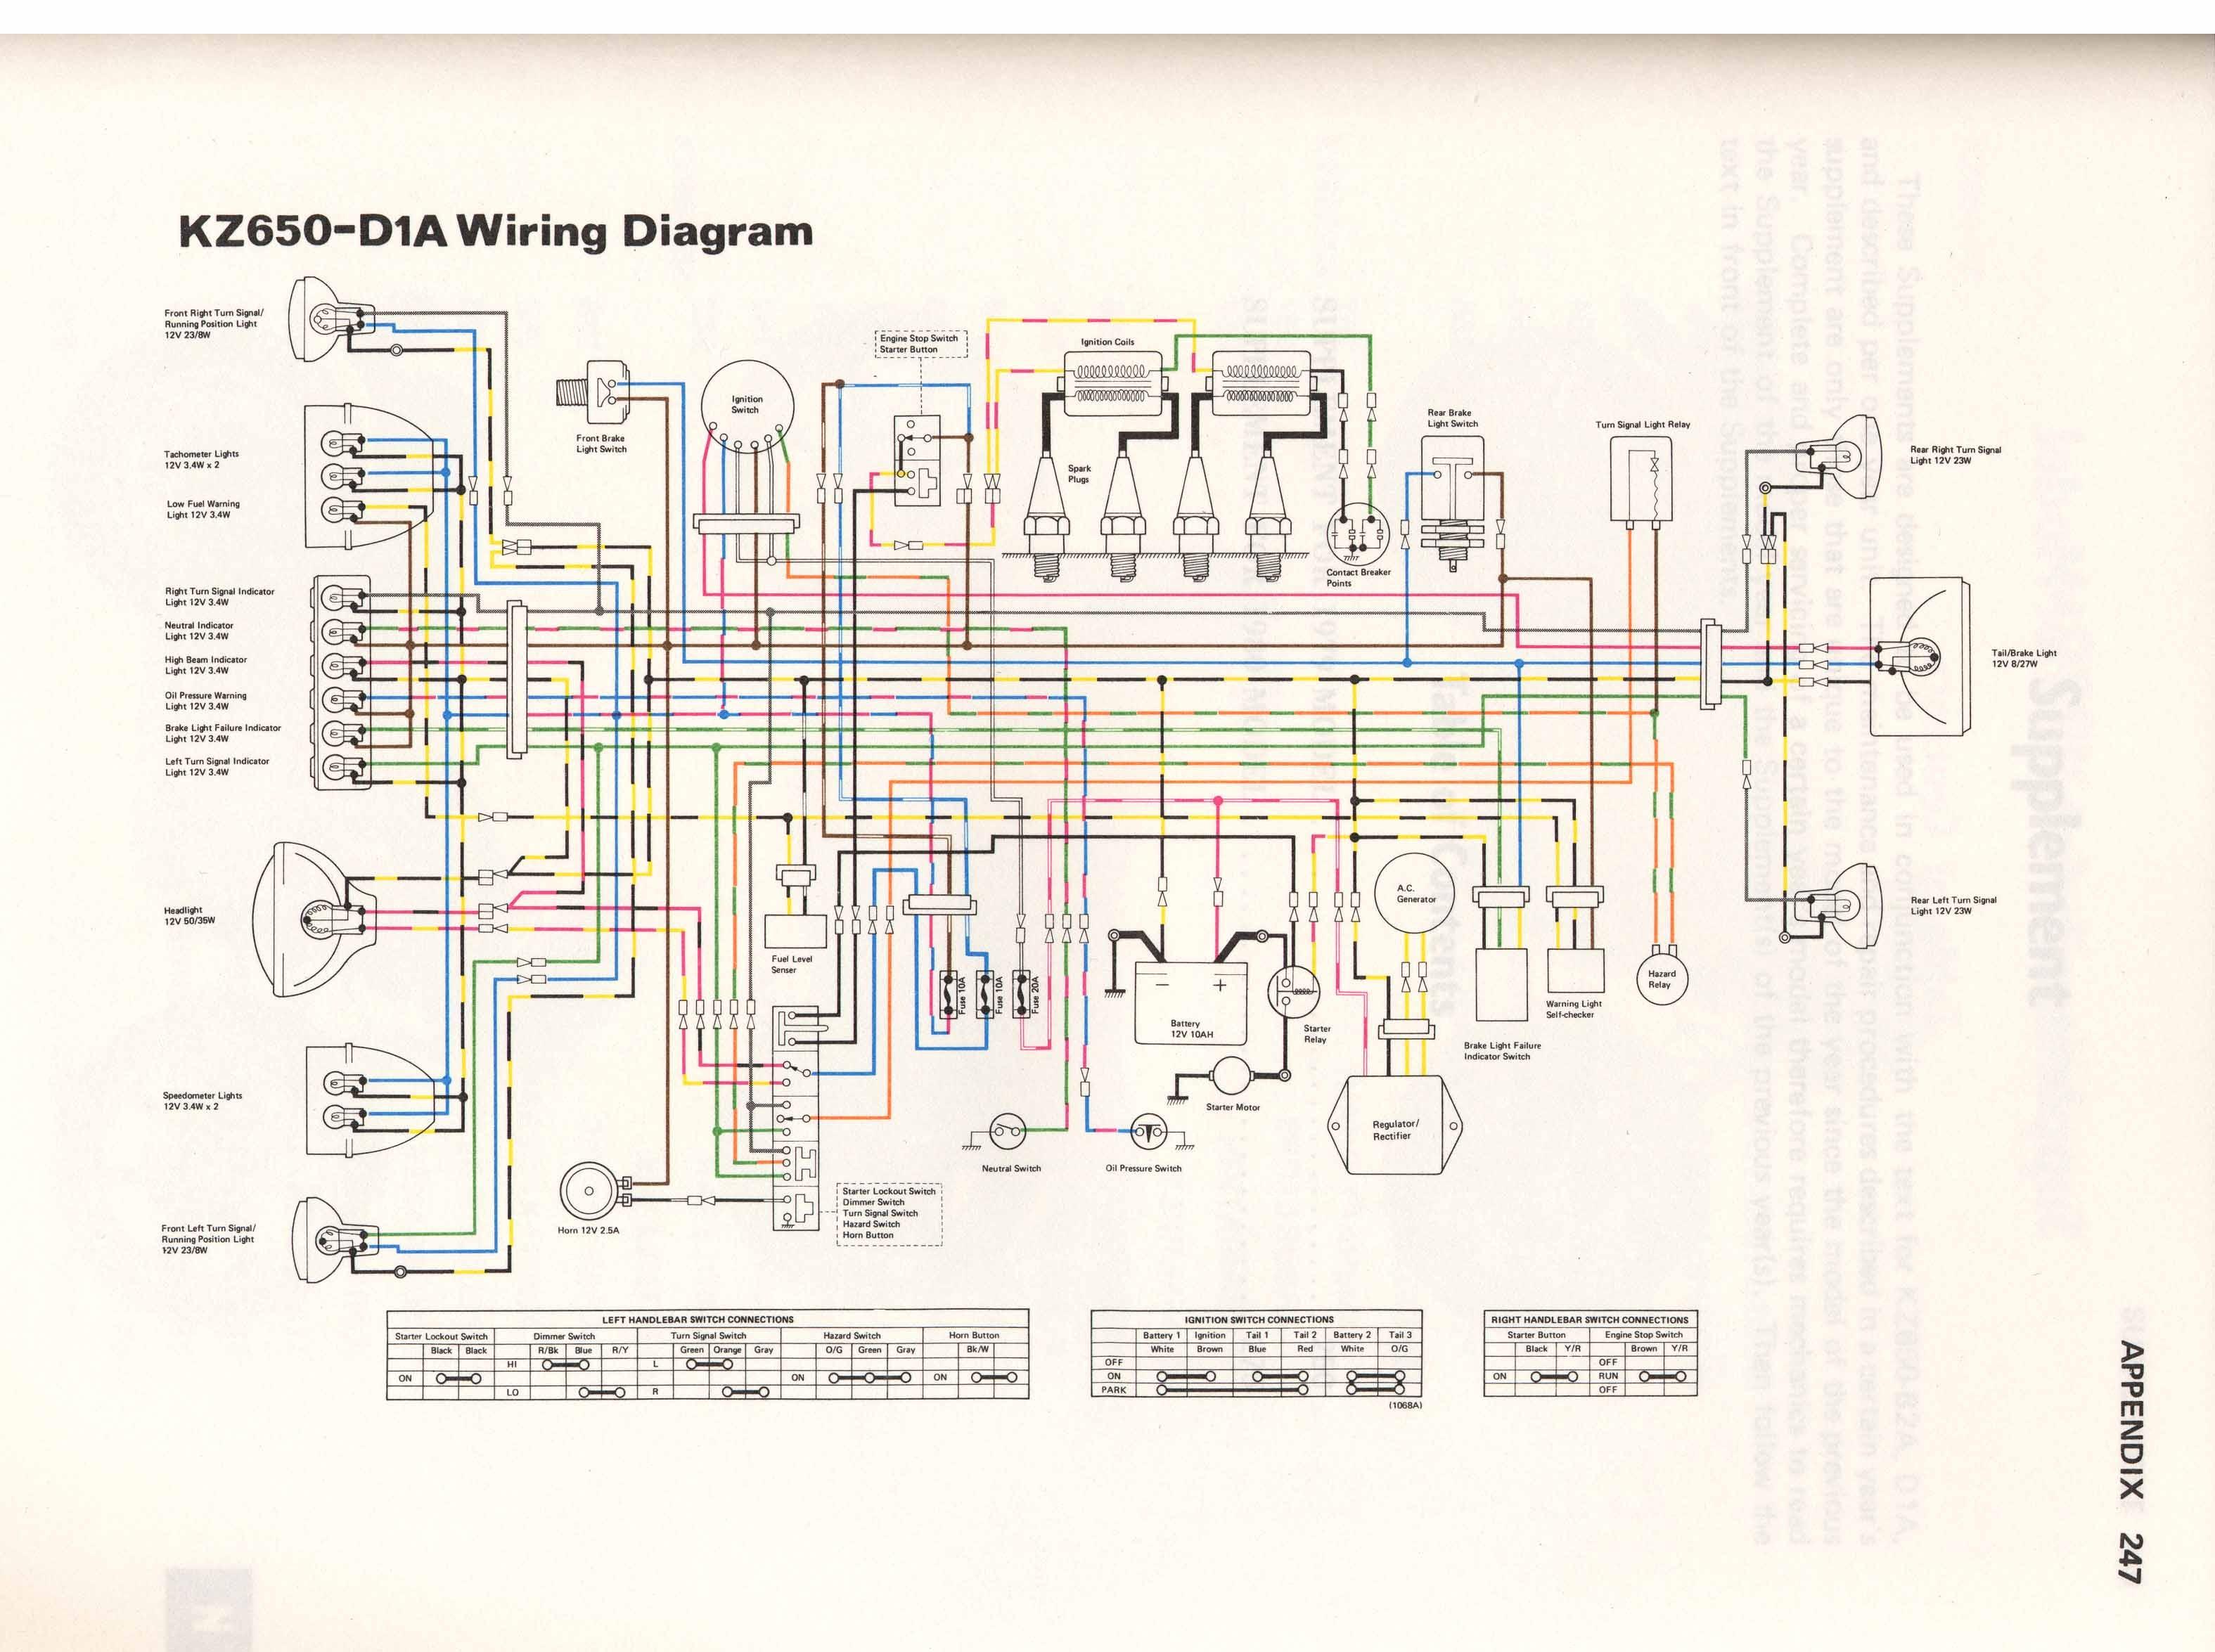 B2a Kz650 Wiring Diagram | Wiring Diagram on ninja 250r wiring diagram, kawasaki wiring diagram, kl600 wiring diagram, zx10 wiring diagram, ex250 wiring diagram, kz1300 wiring diagram, zg1000 wiring diagram, kz440 wiring diagram, z1 wiring diagram, z1000 wiring diagram, gs550 wiring diagram, h1 wiring diagram, z400 wiring diagram, zl900 eliminator wiring diagram, kz1000 wiring diagram, zx1000 wiring diagram, er6n wiring diagram, klr250 wiring diagram, klr650 wiring diagram, gs750 wiring diagram,